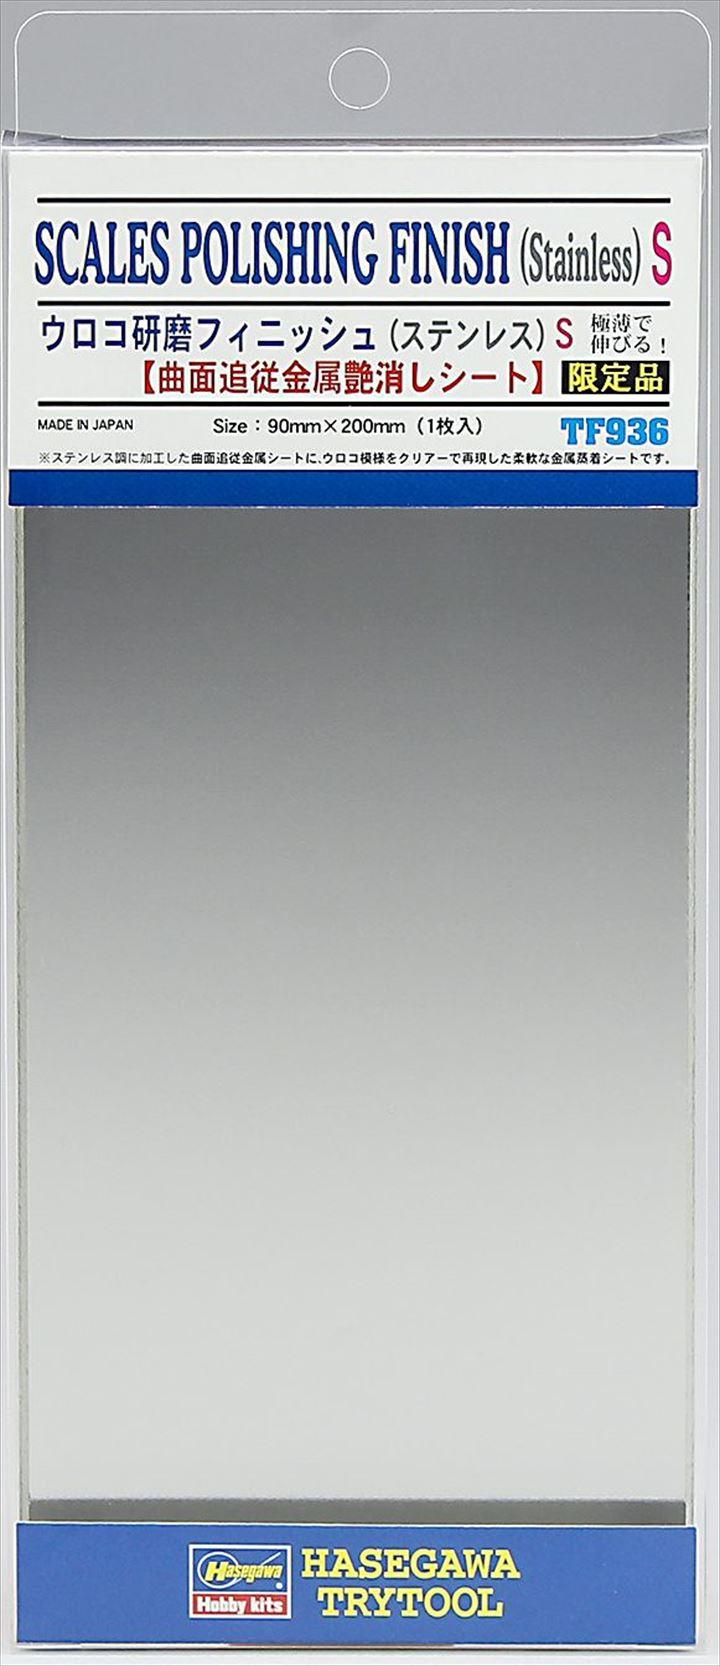 TF936 ウロコ研磨フィニッシュ(ステンレス)S【曲面追従金属艶消しシート】